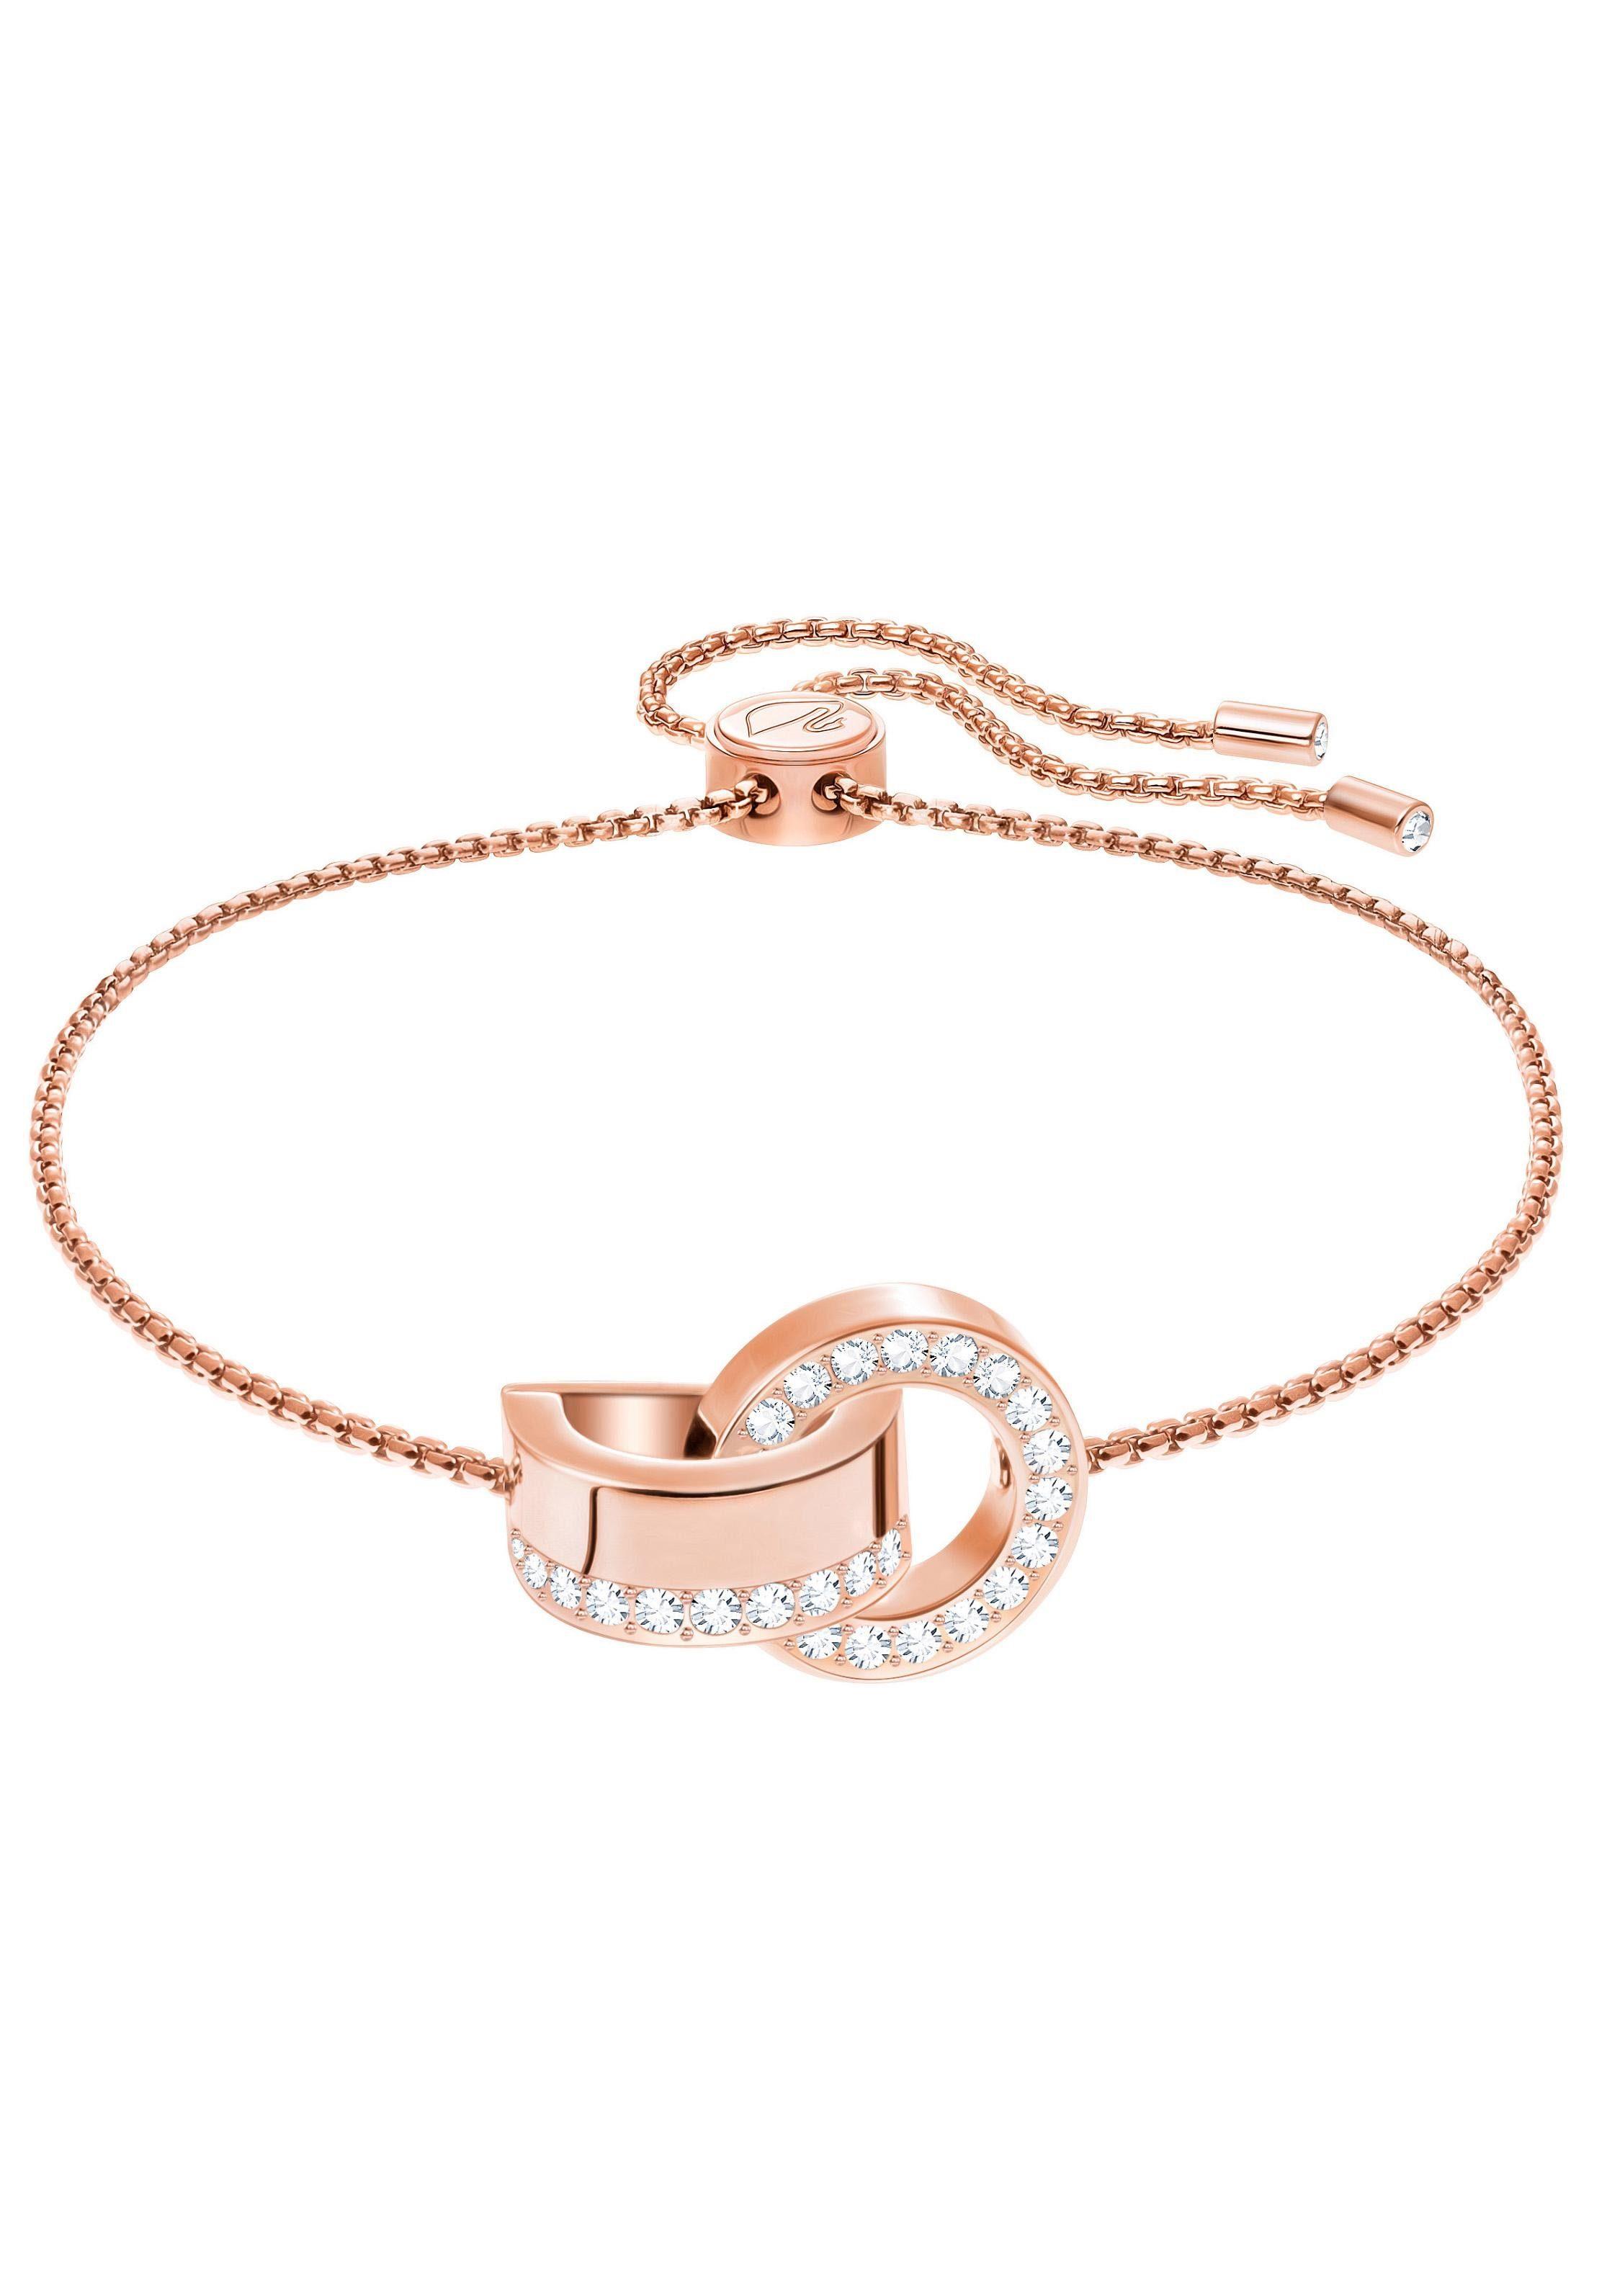 Swarovski Armband »Hollow Armband, weiss, rosé Vergoldung, 5368040« mit Swarovski® Kristallen